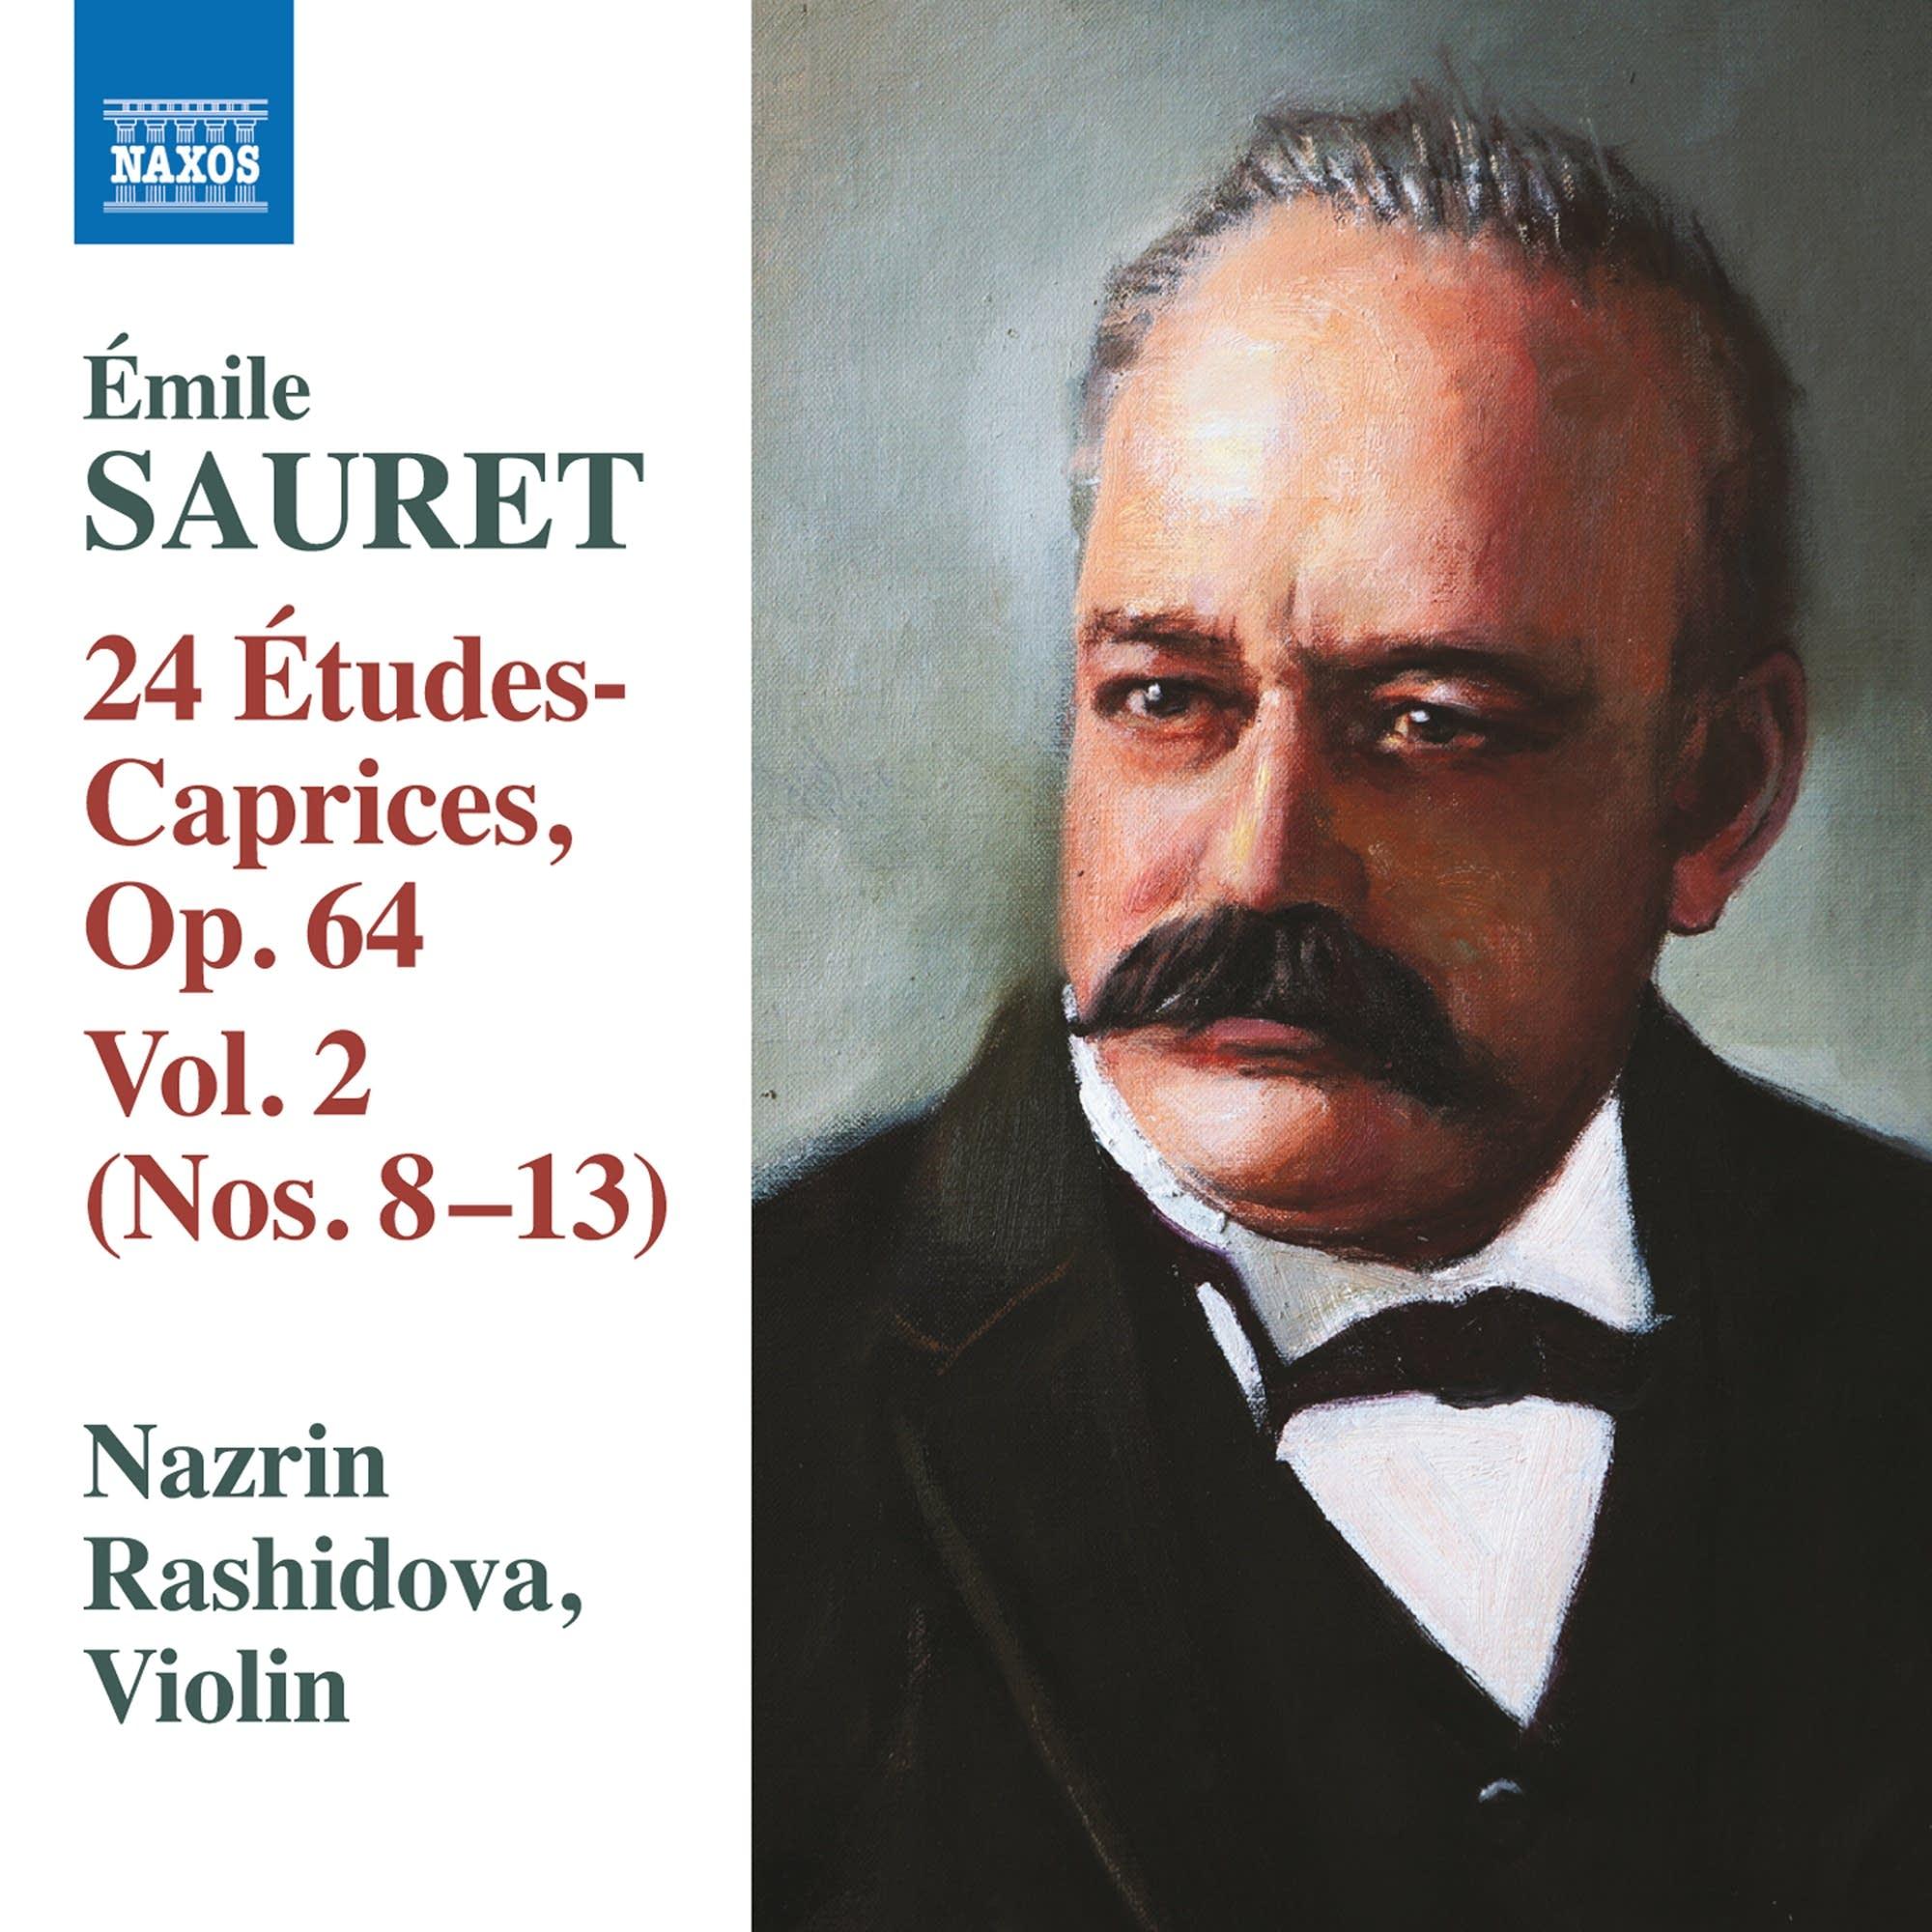 Emile Sauret - Etude Caprice No. 11